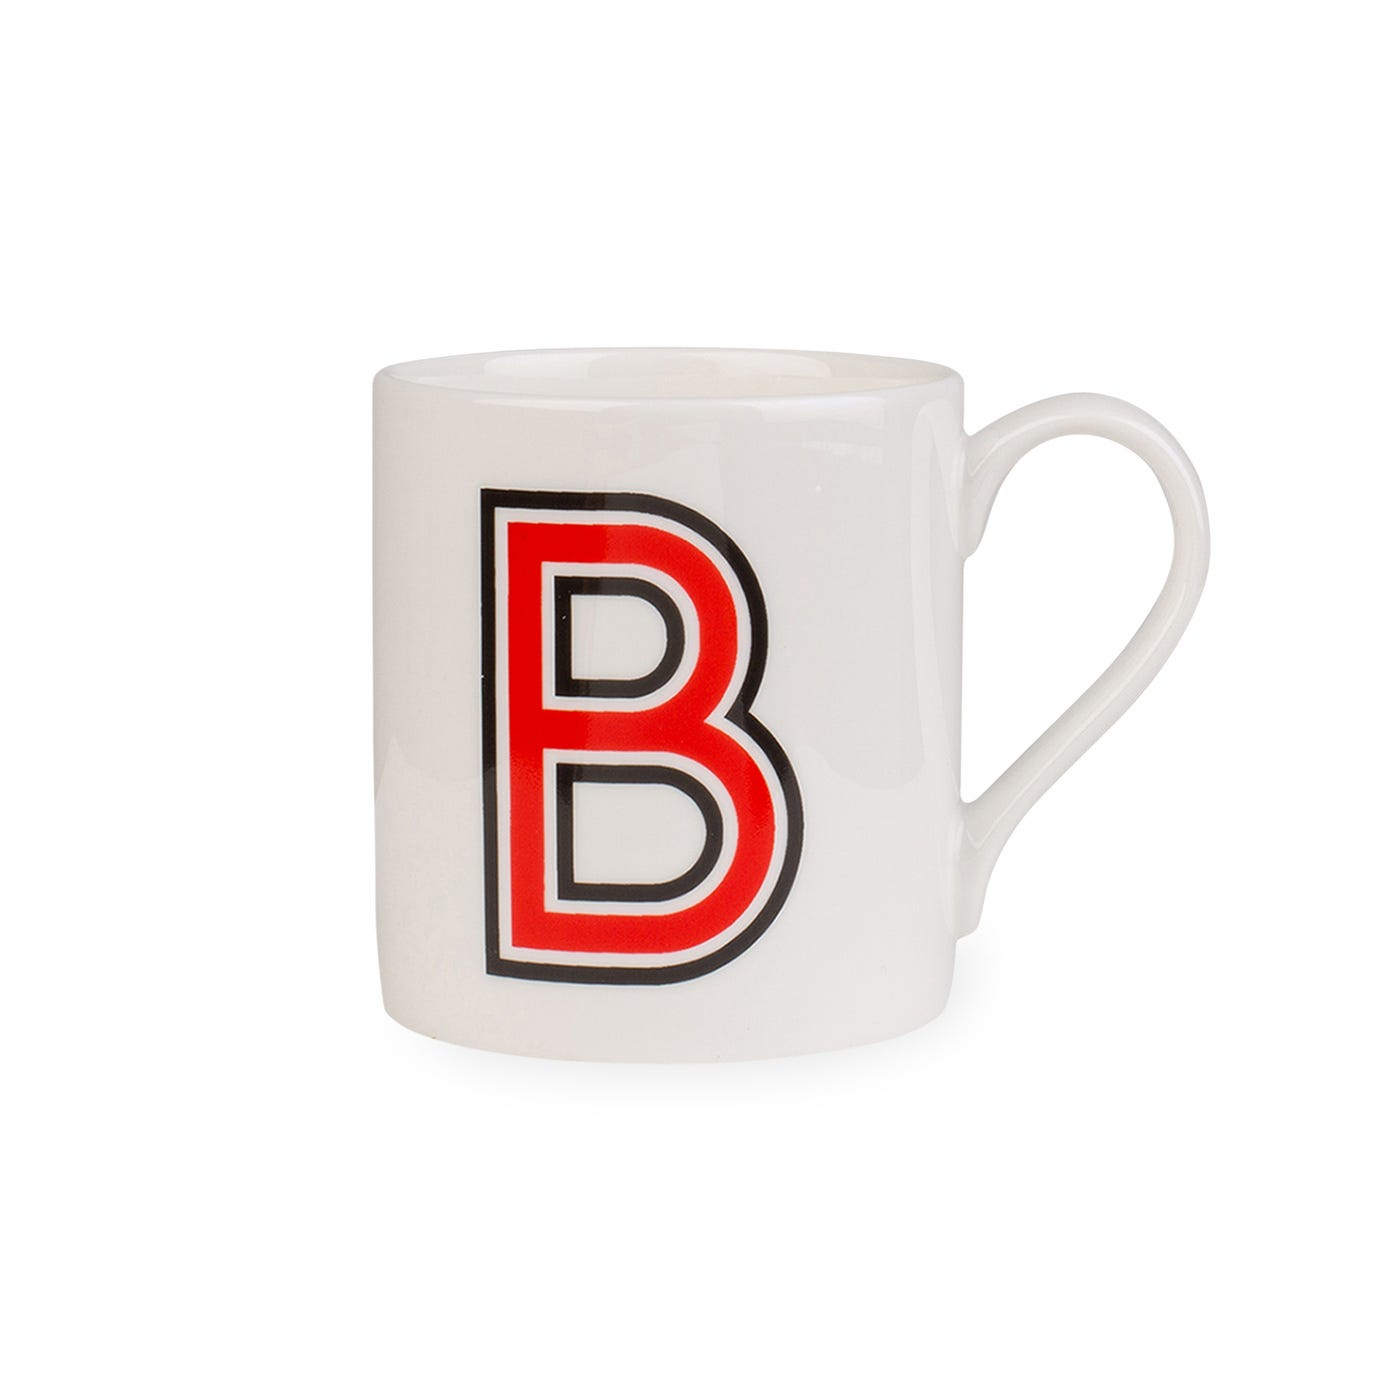 Heal's Heal's Heritage Alphabet Mug B